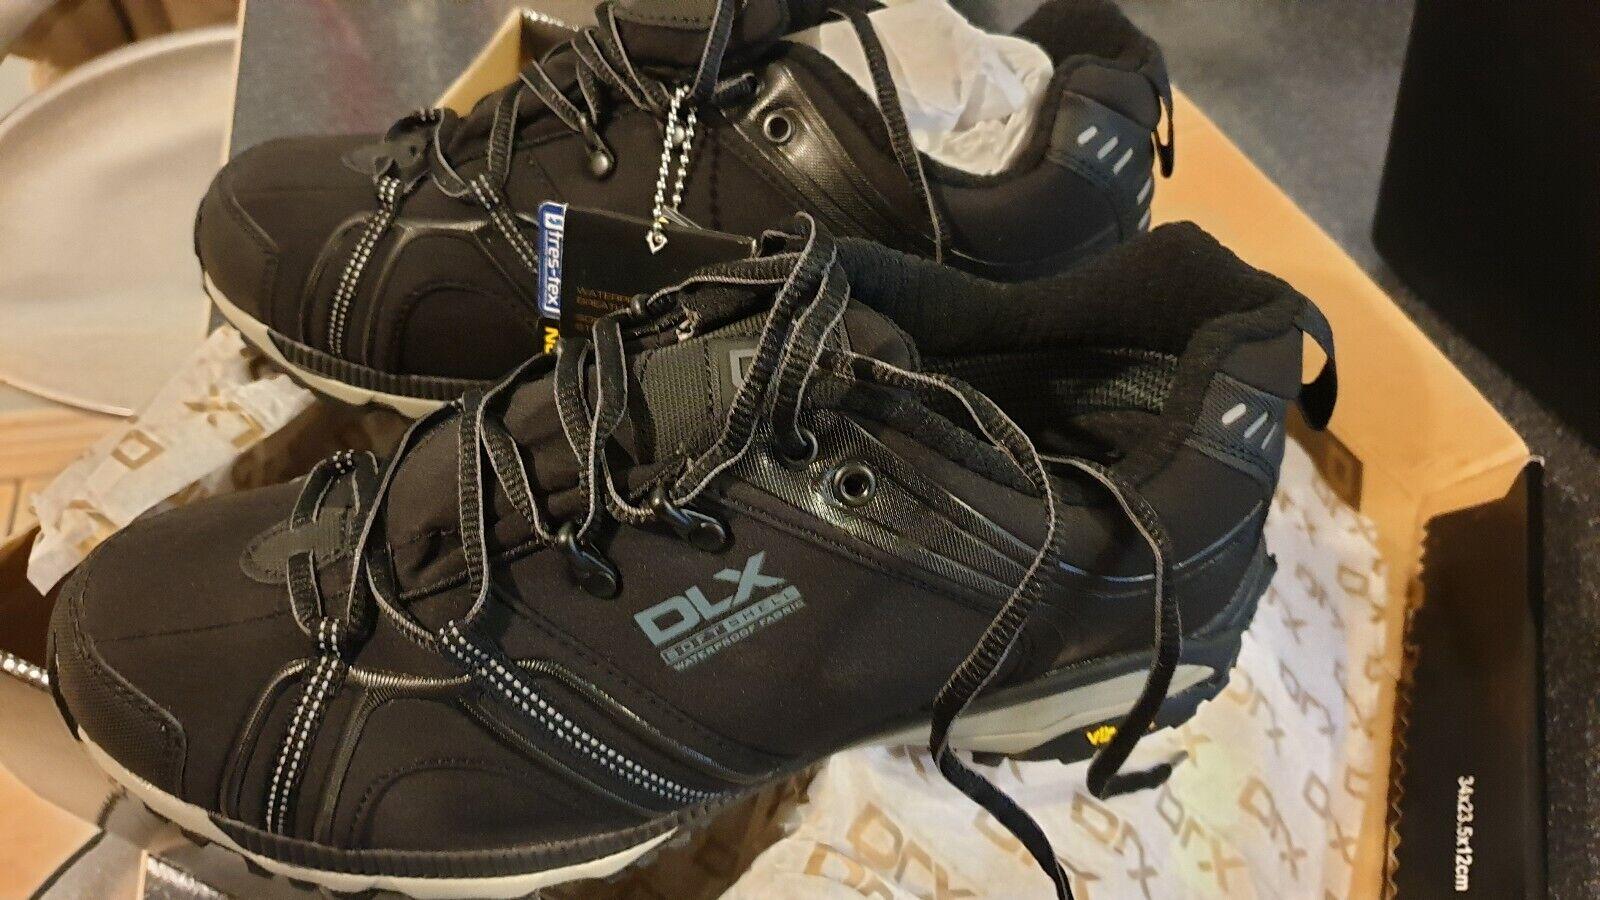 1600716d3e633 Trespass DLX Softshell Keyboard shoes UK 9 Hiking Size oxvqds13596-Men